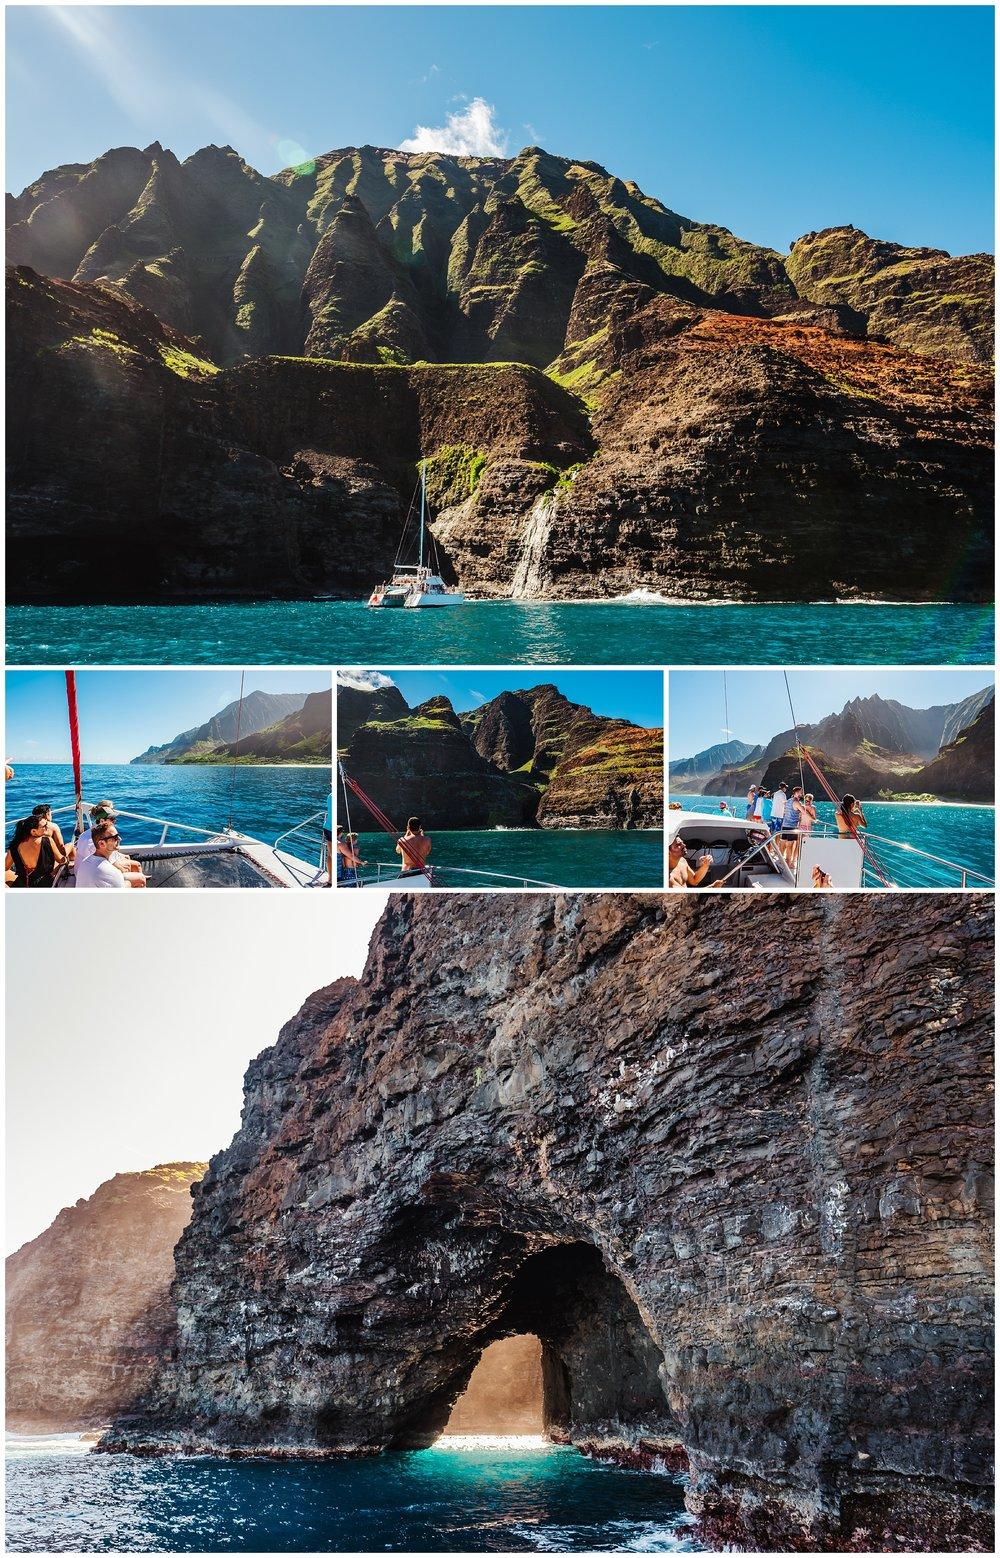 destination-wedding-hawaii-kauai-grand-hyatt-resort-napali-coast-sail_0009.jpg